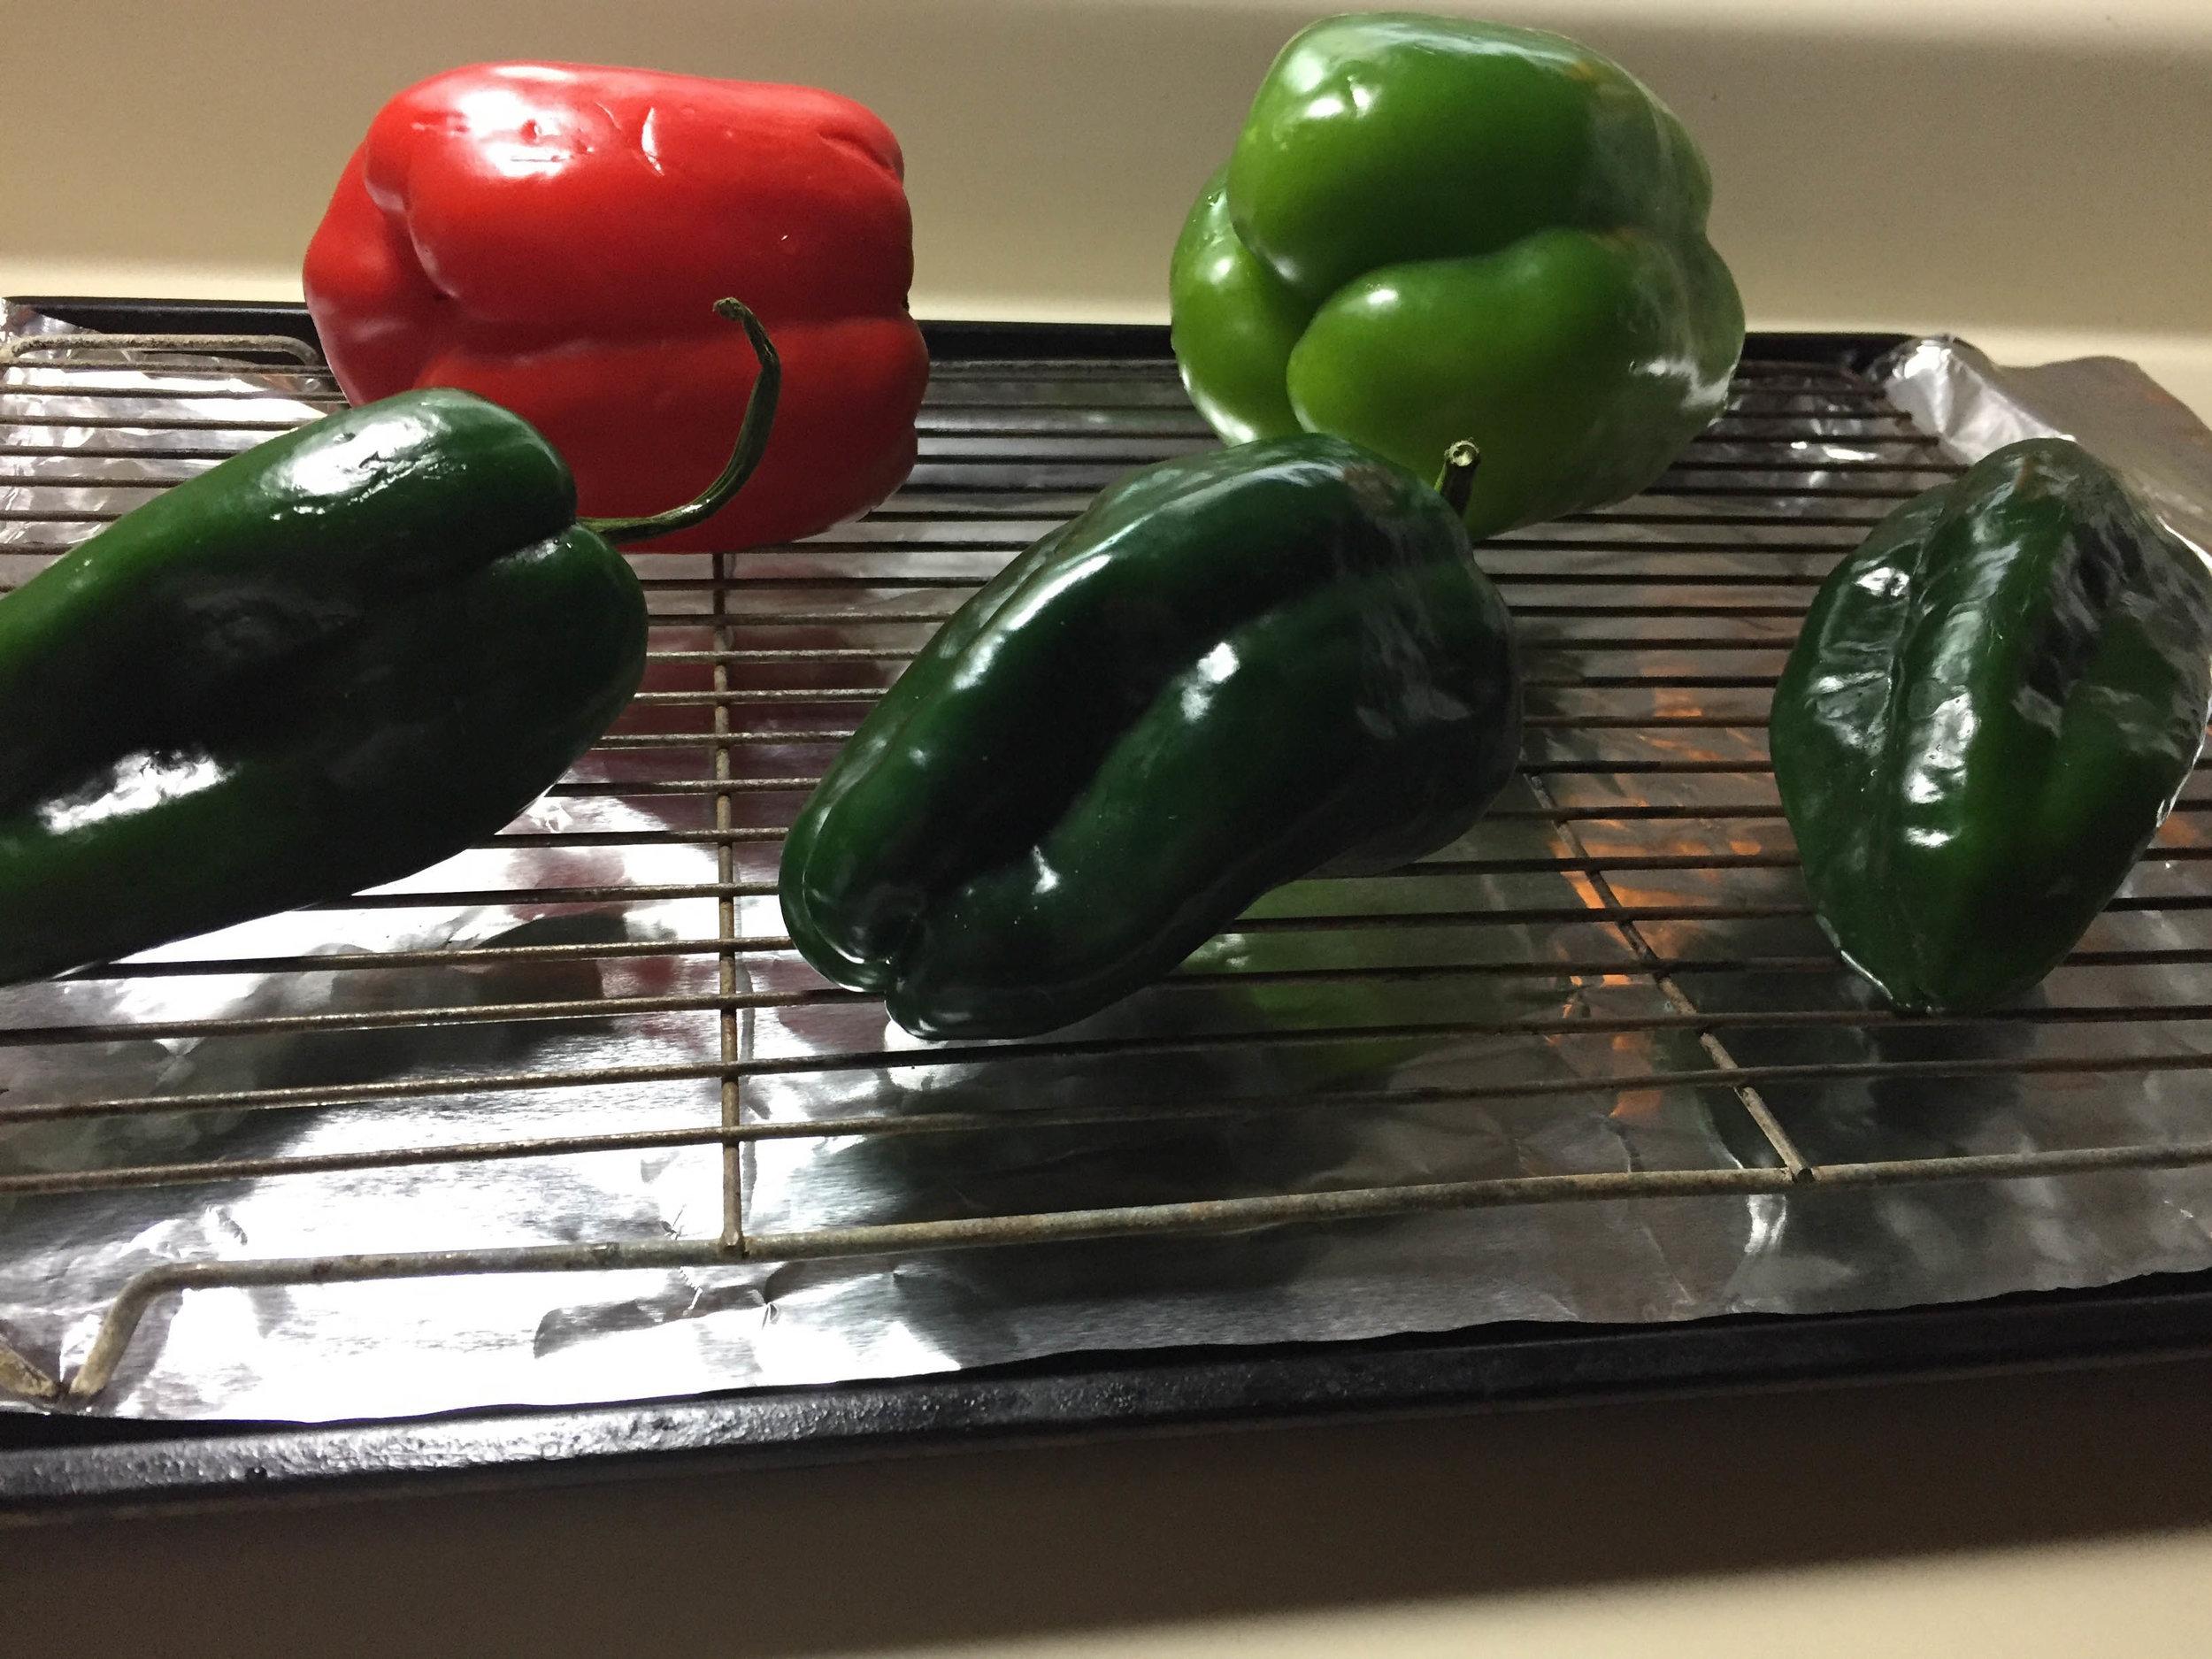 roasted_veggies_salad_chicken_main-4.jpg